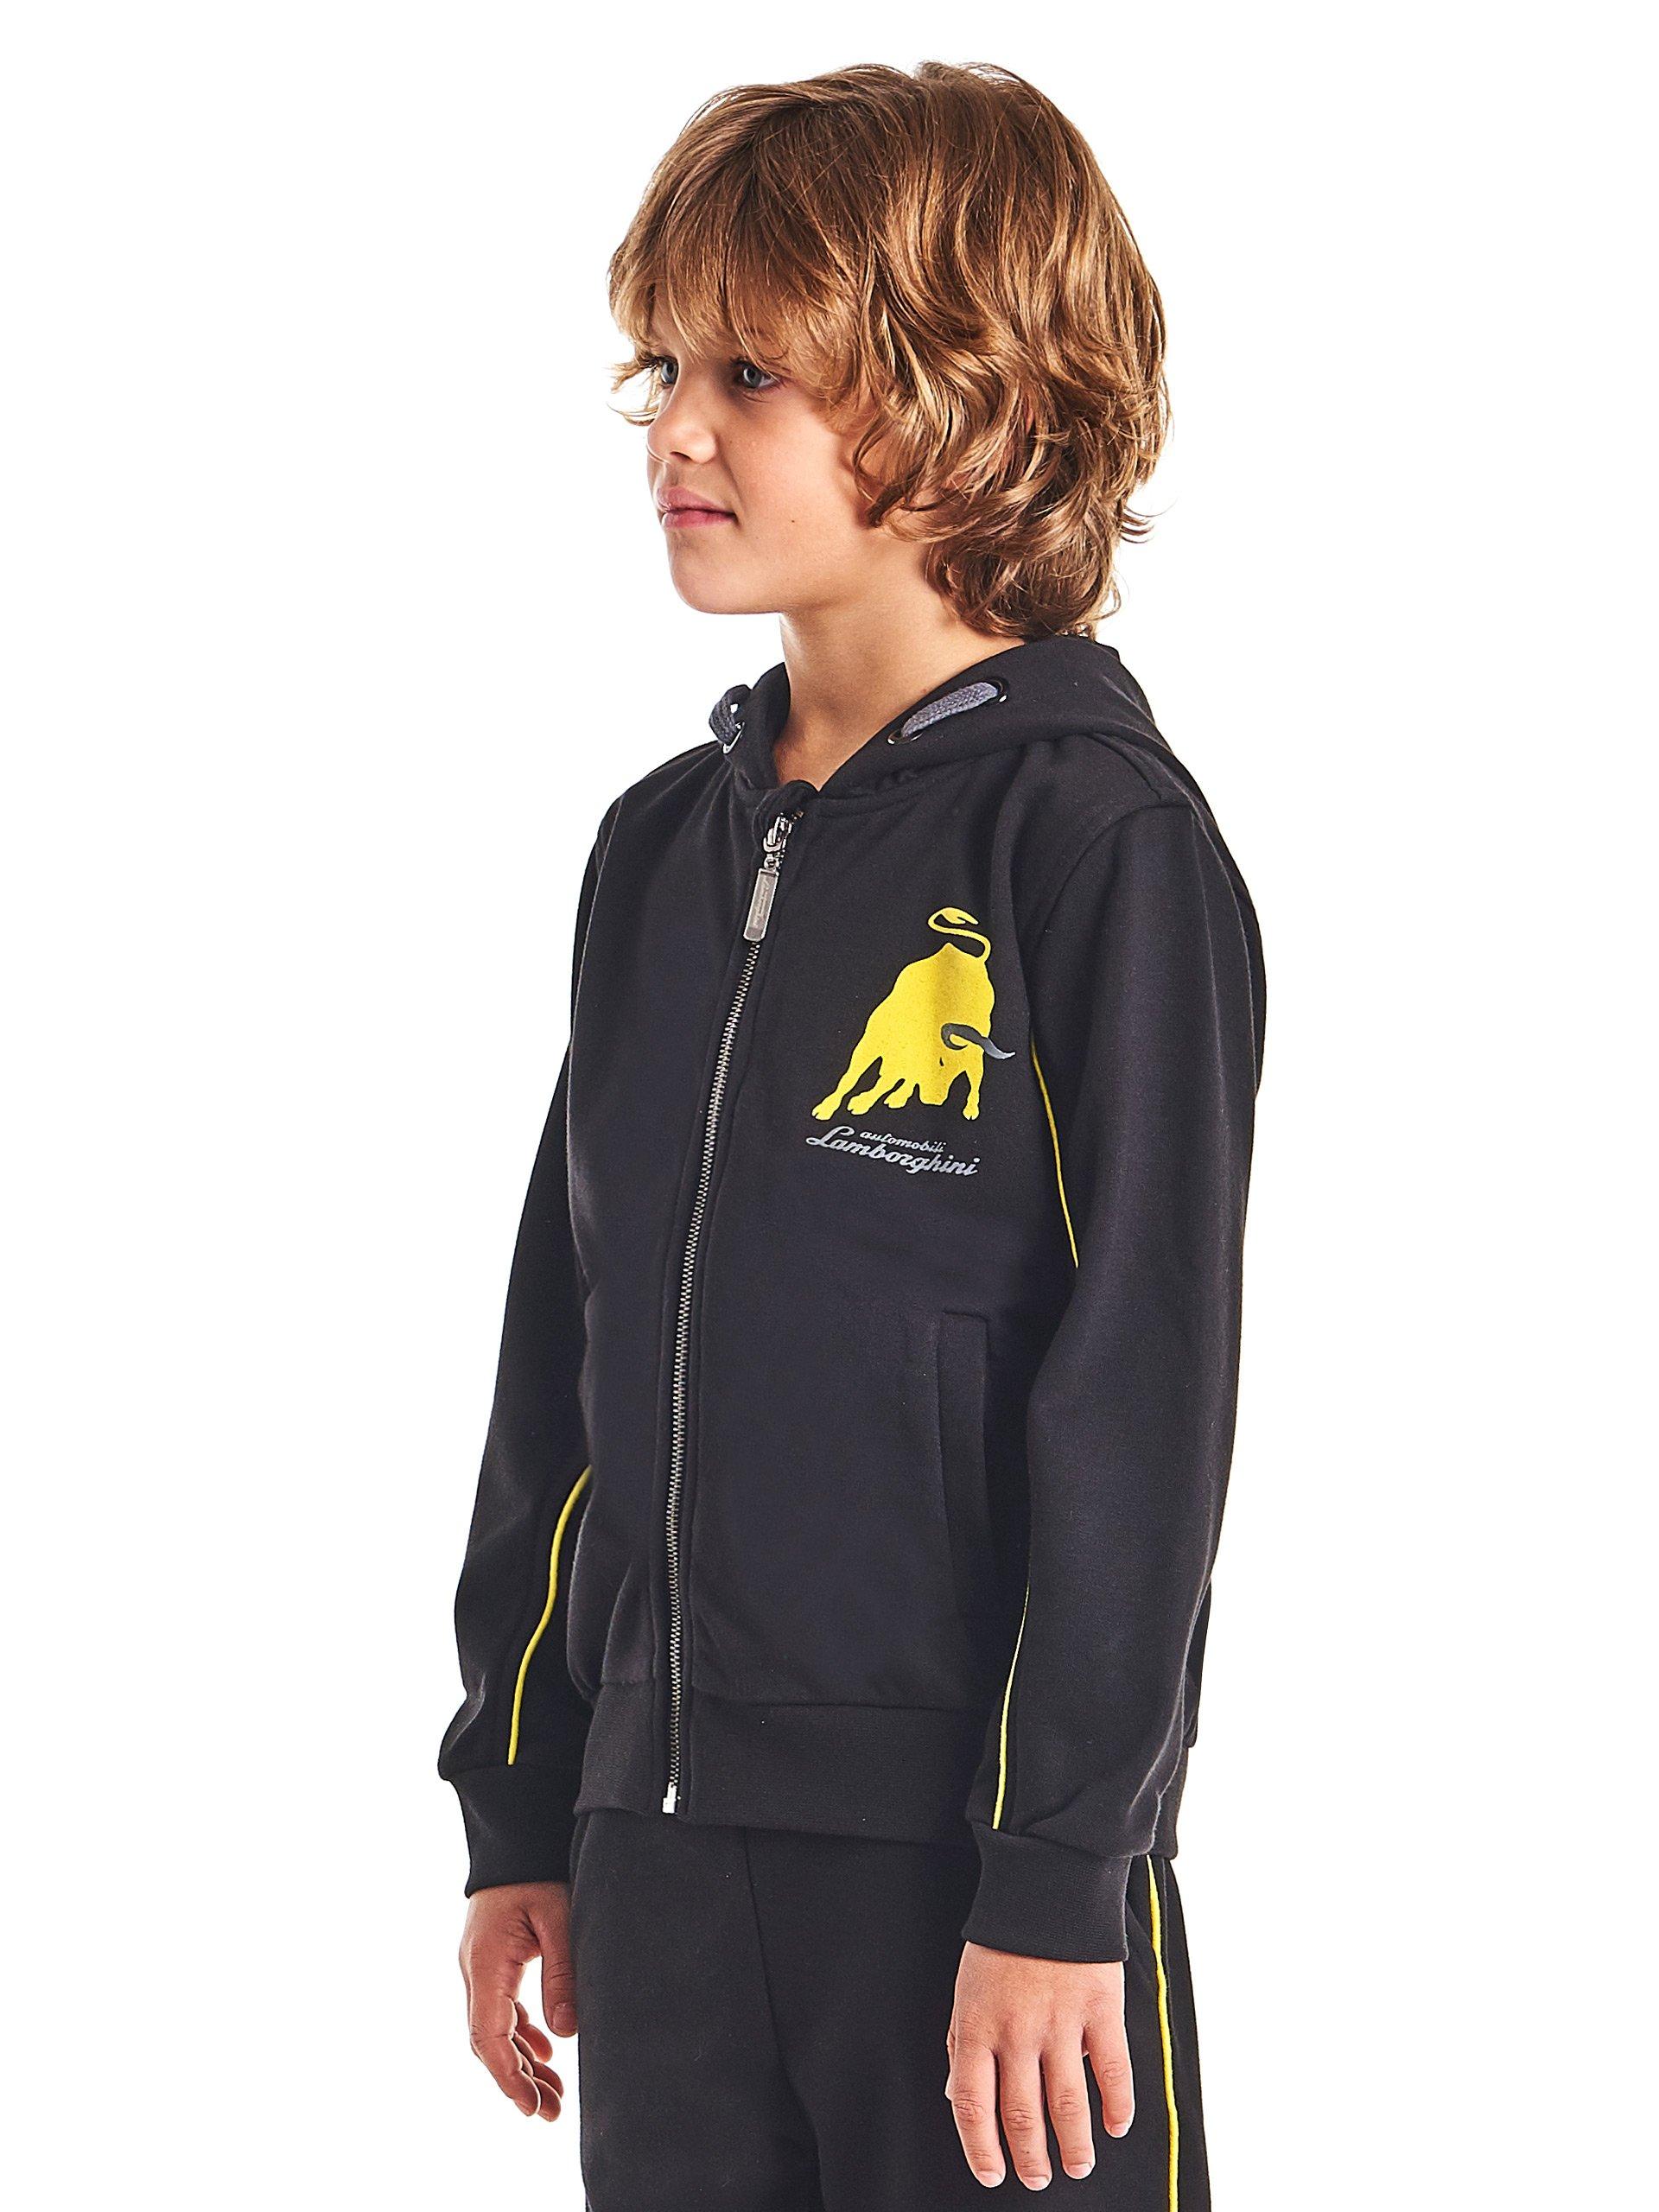 Automobili Lamborghini Children Lamborghini Big-Bull Hooded Sweatshirt for Kids 4 Years Black by Automobili Lamborghini (Image #2)